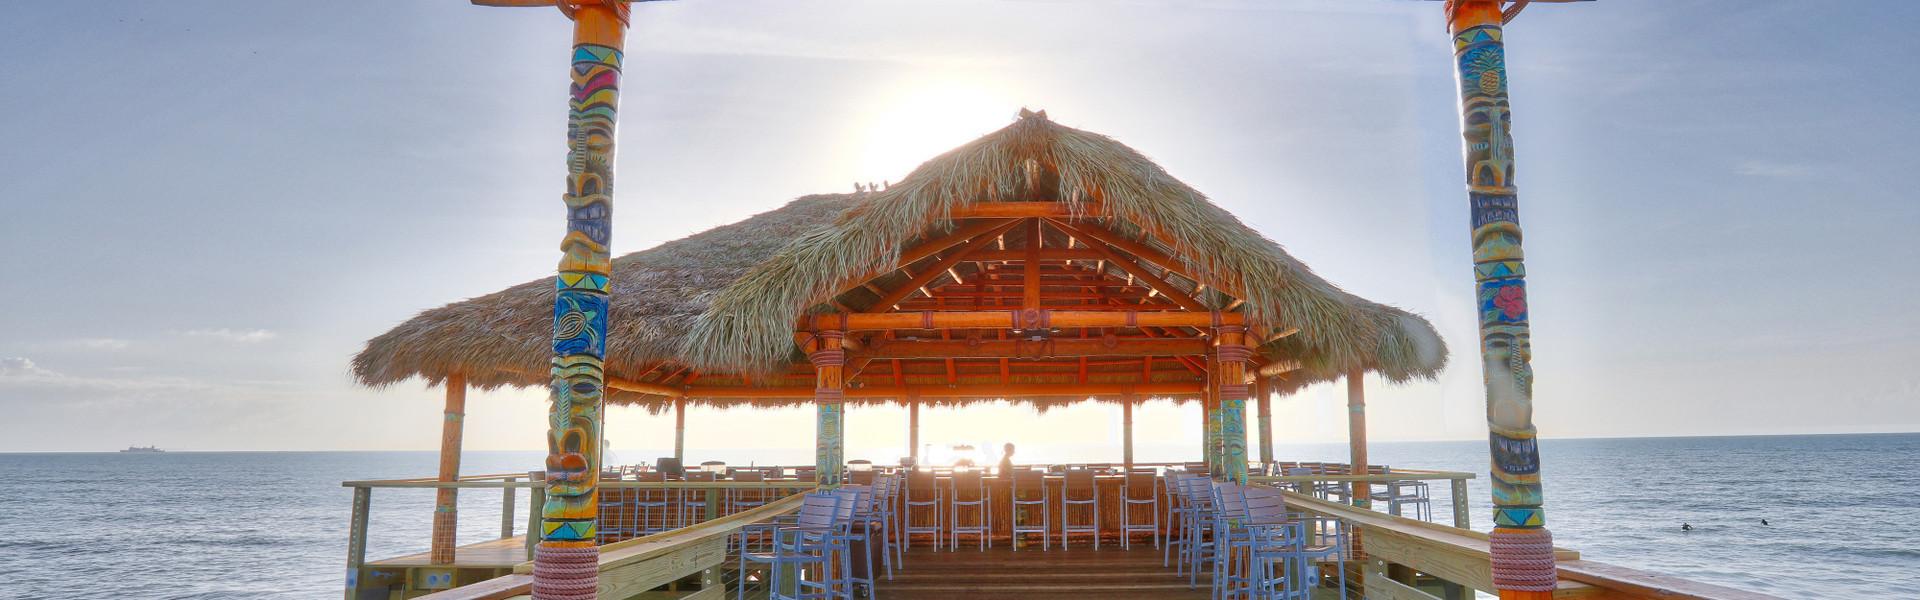 Rikki Tiki Tavern at Westgate Cocoa Beach Pier near our Cocoa Beach Hotel